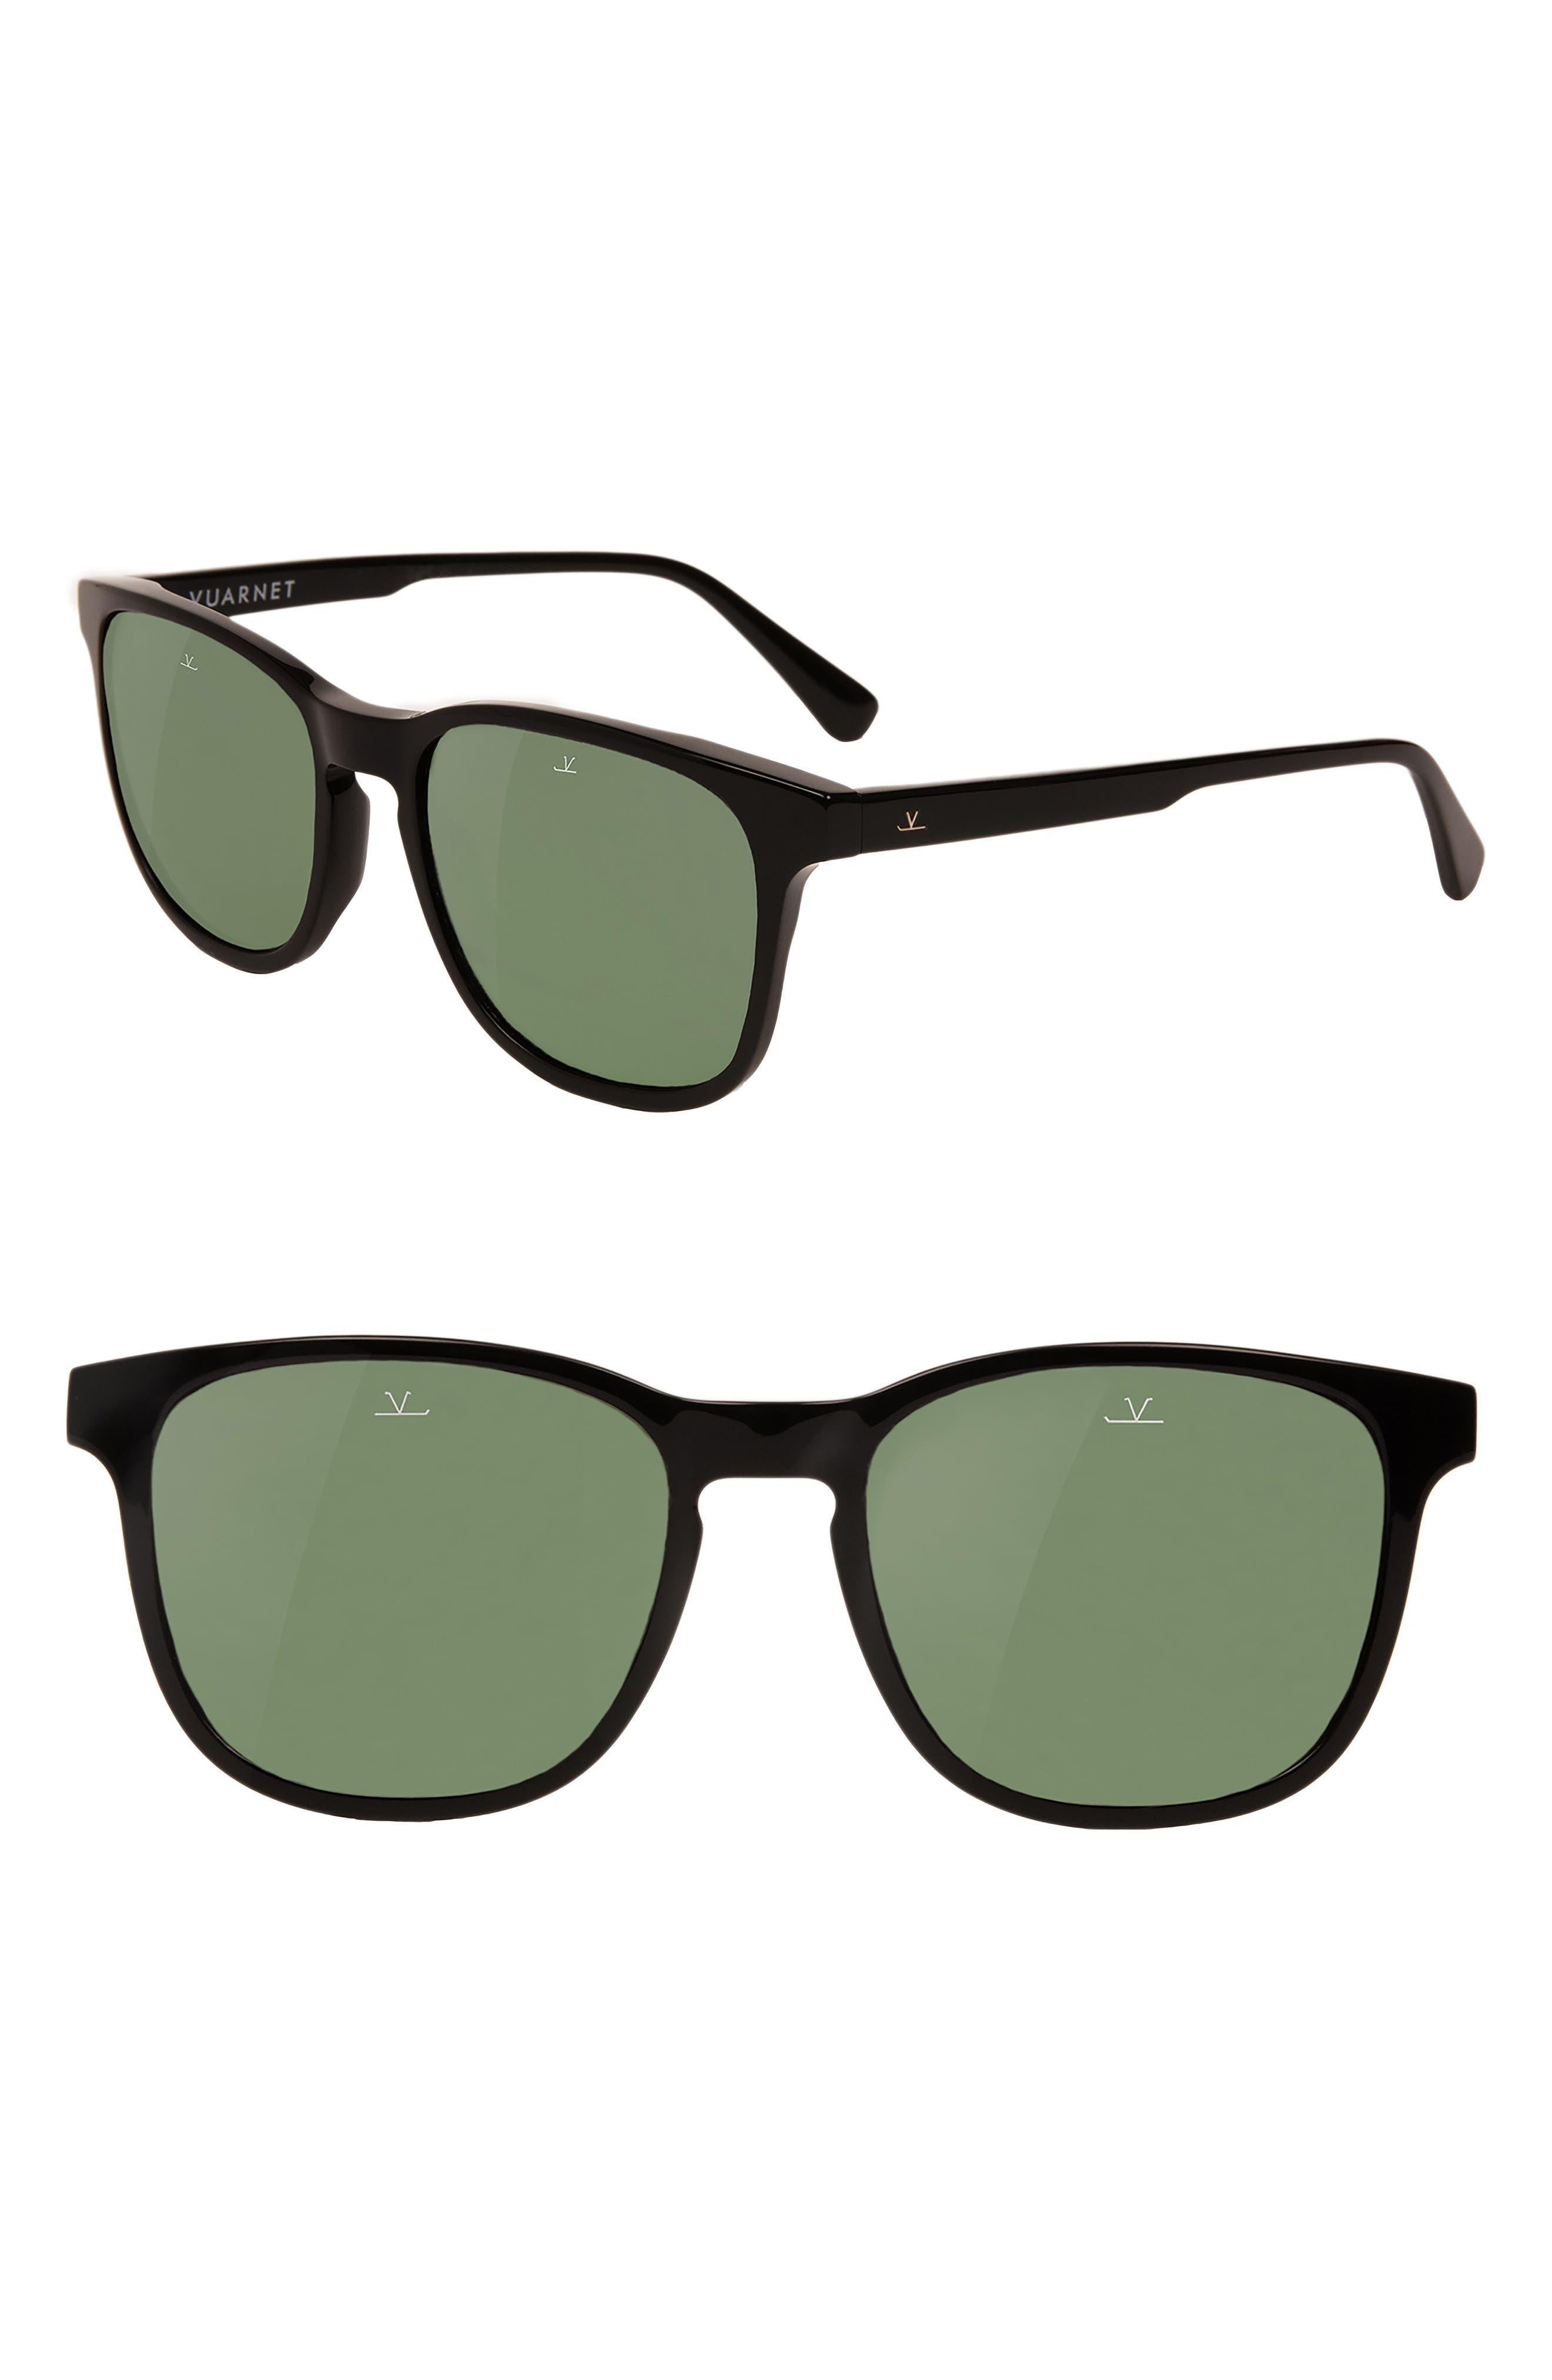 District Medium 53mm Sunglasses,                         Main,                         color, PURE GREY